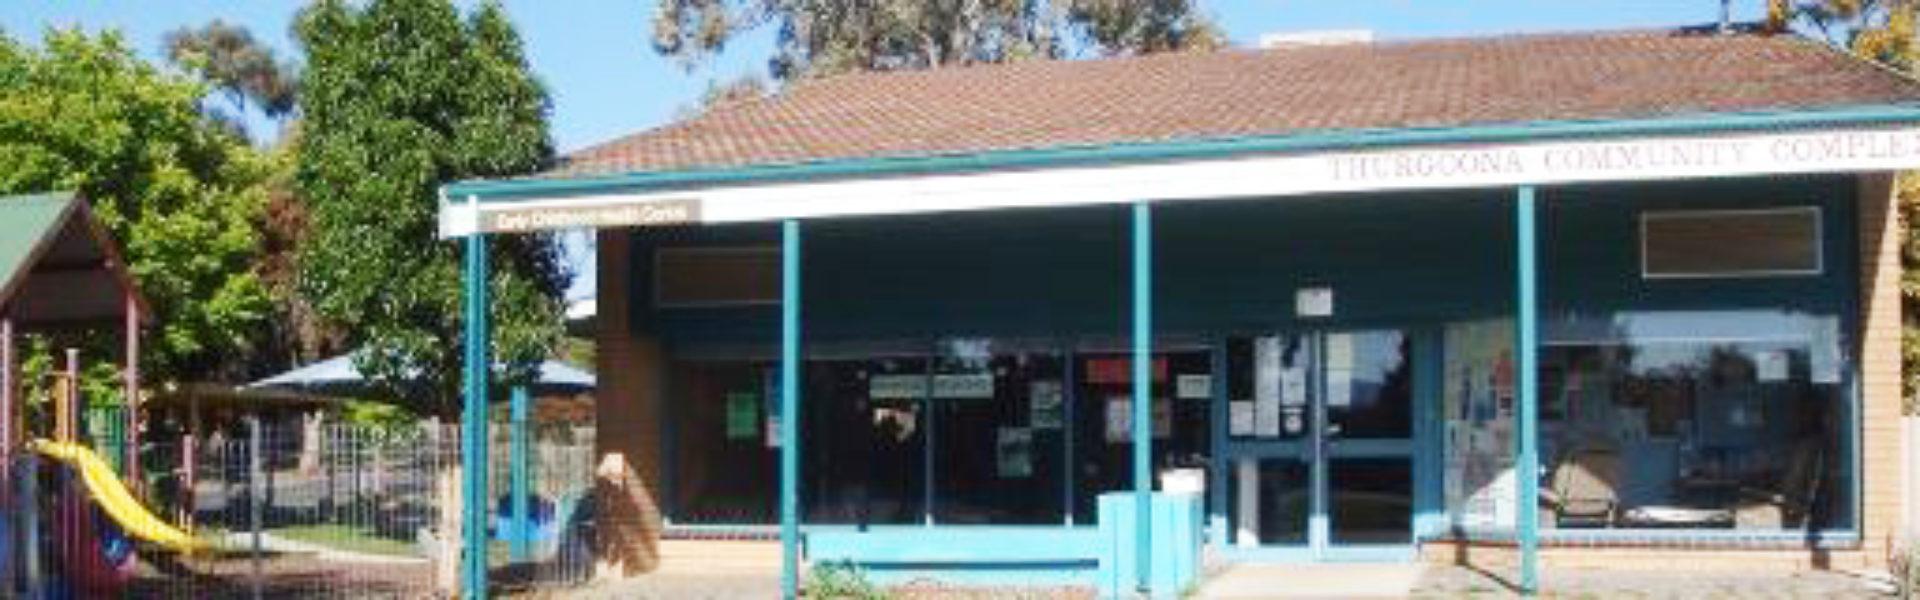 Thurgoona Community Centre